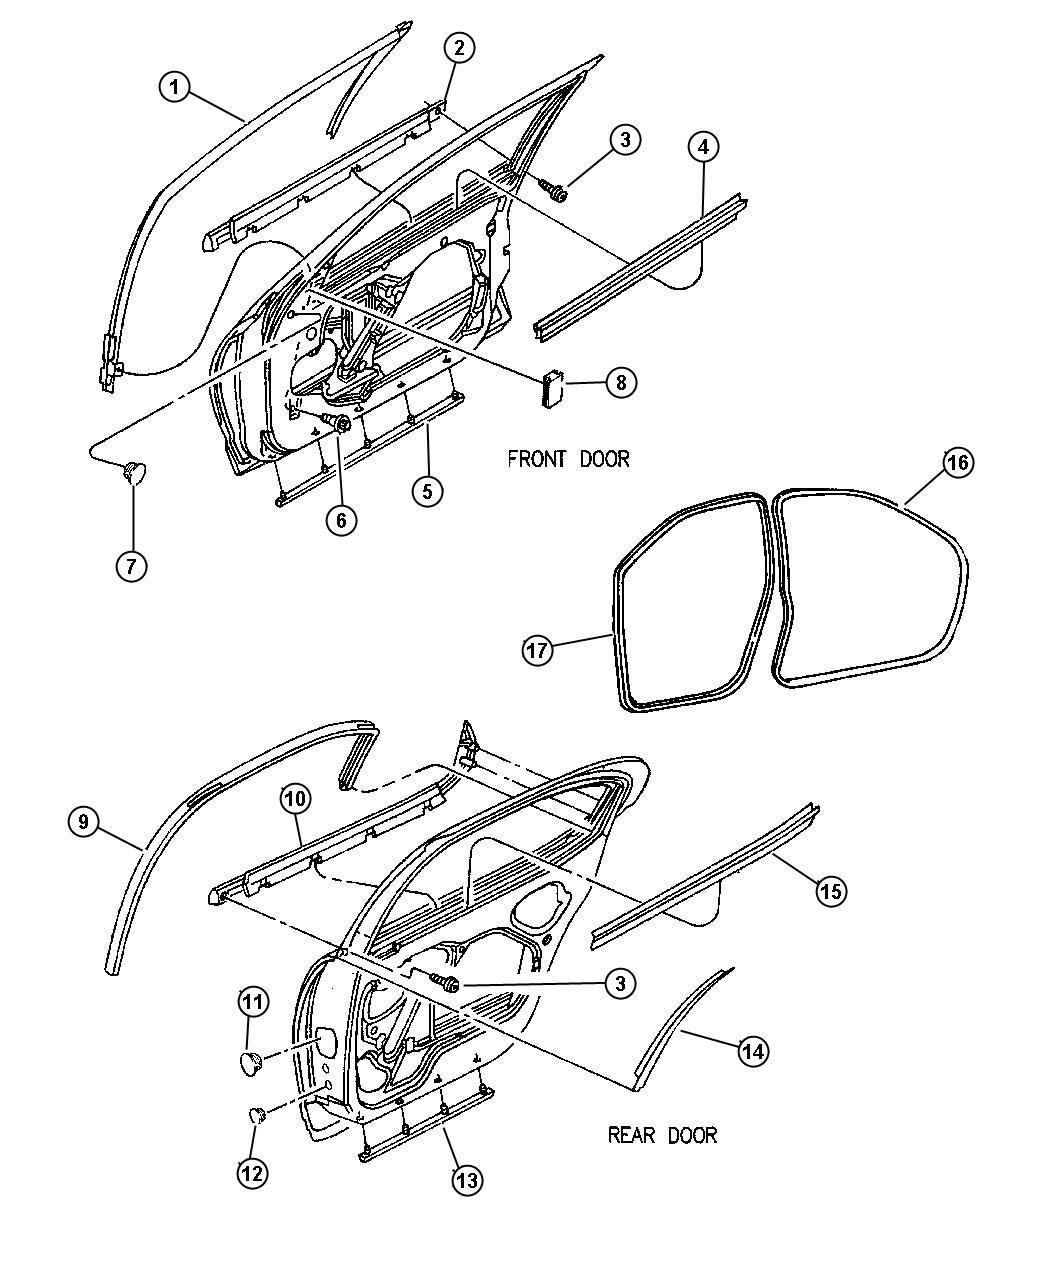 2000 Chrysler Cirrus Weatherstrip. Rear door sill